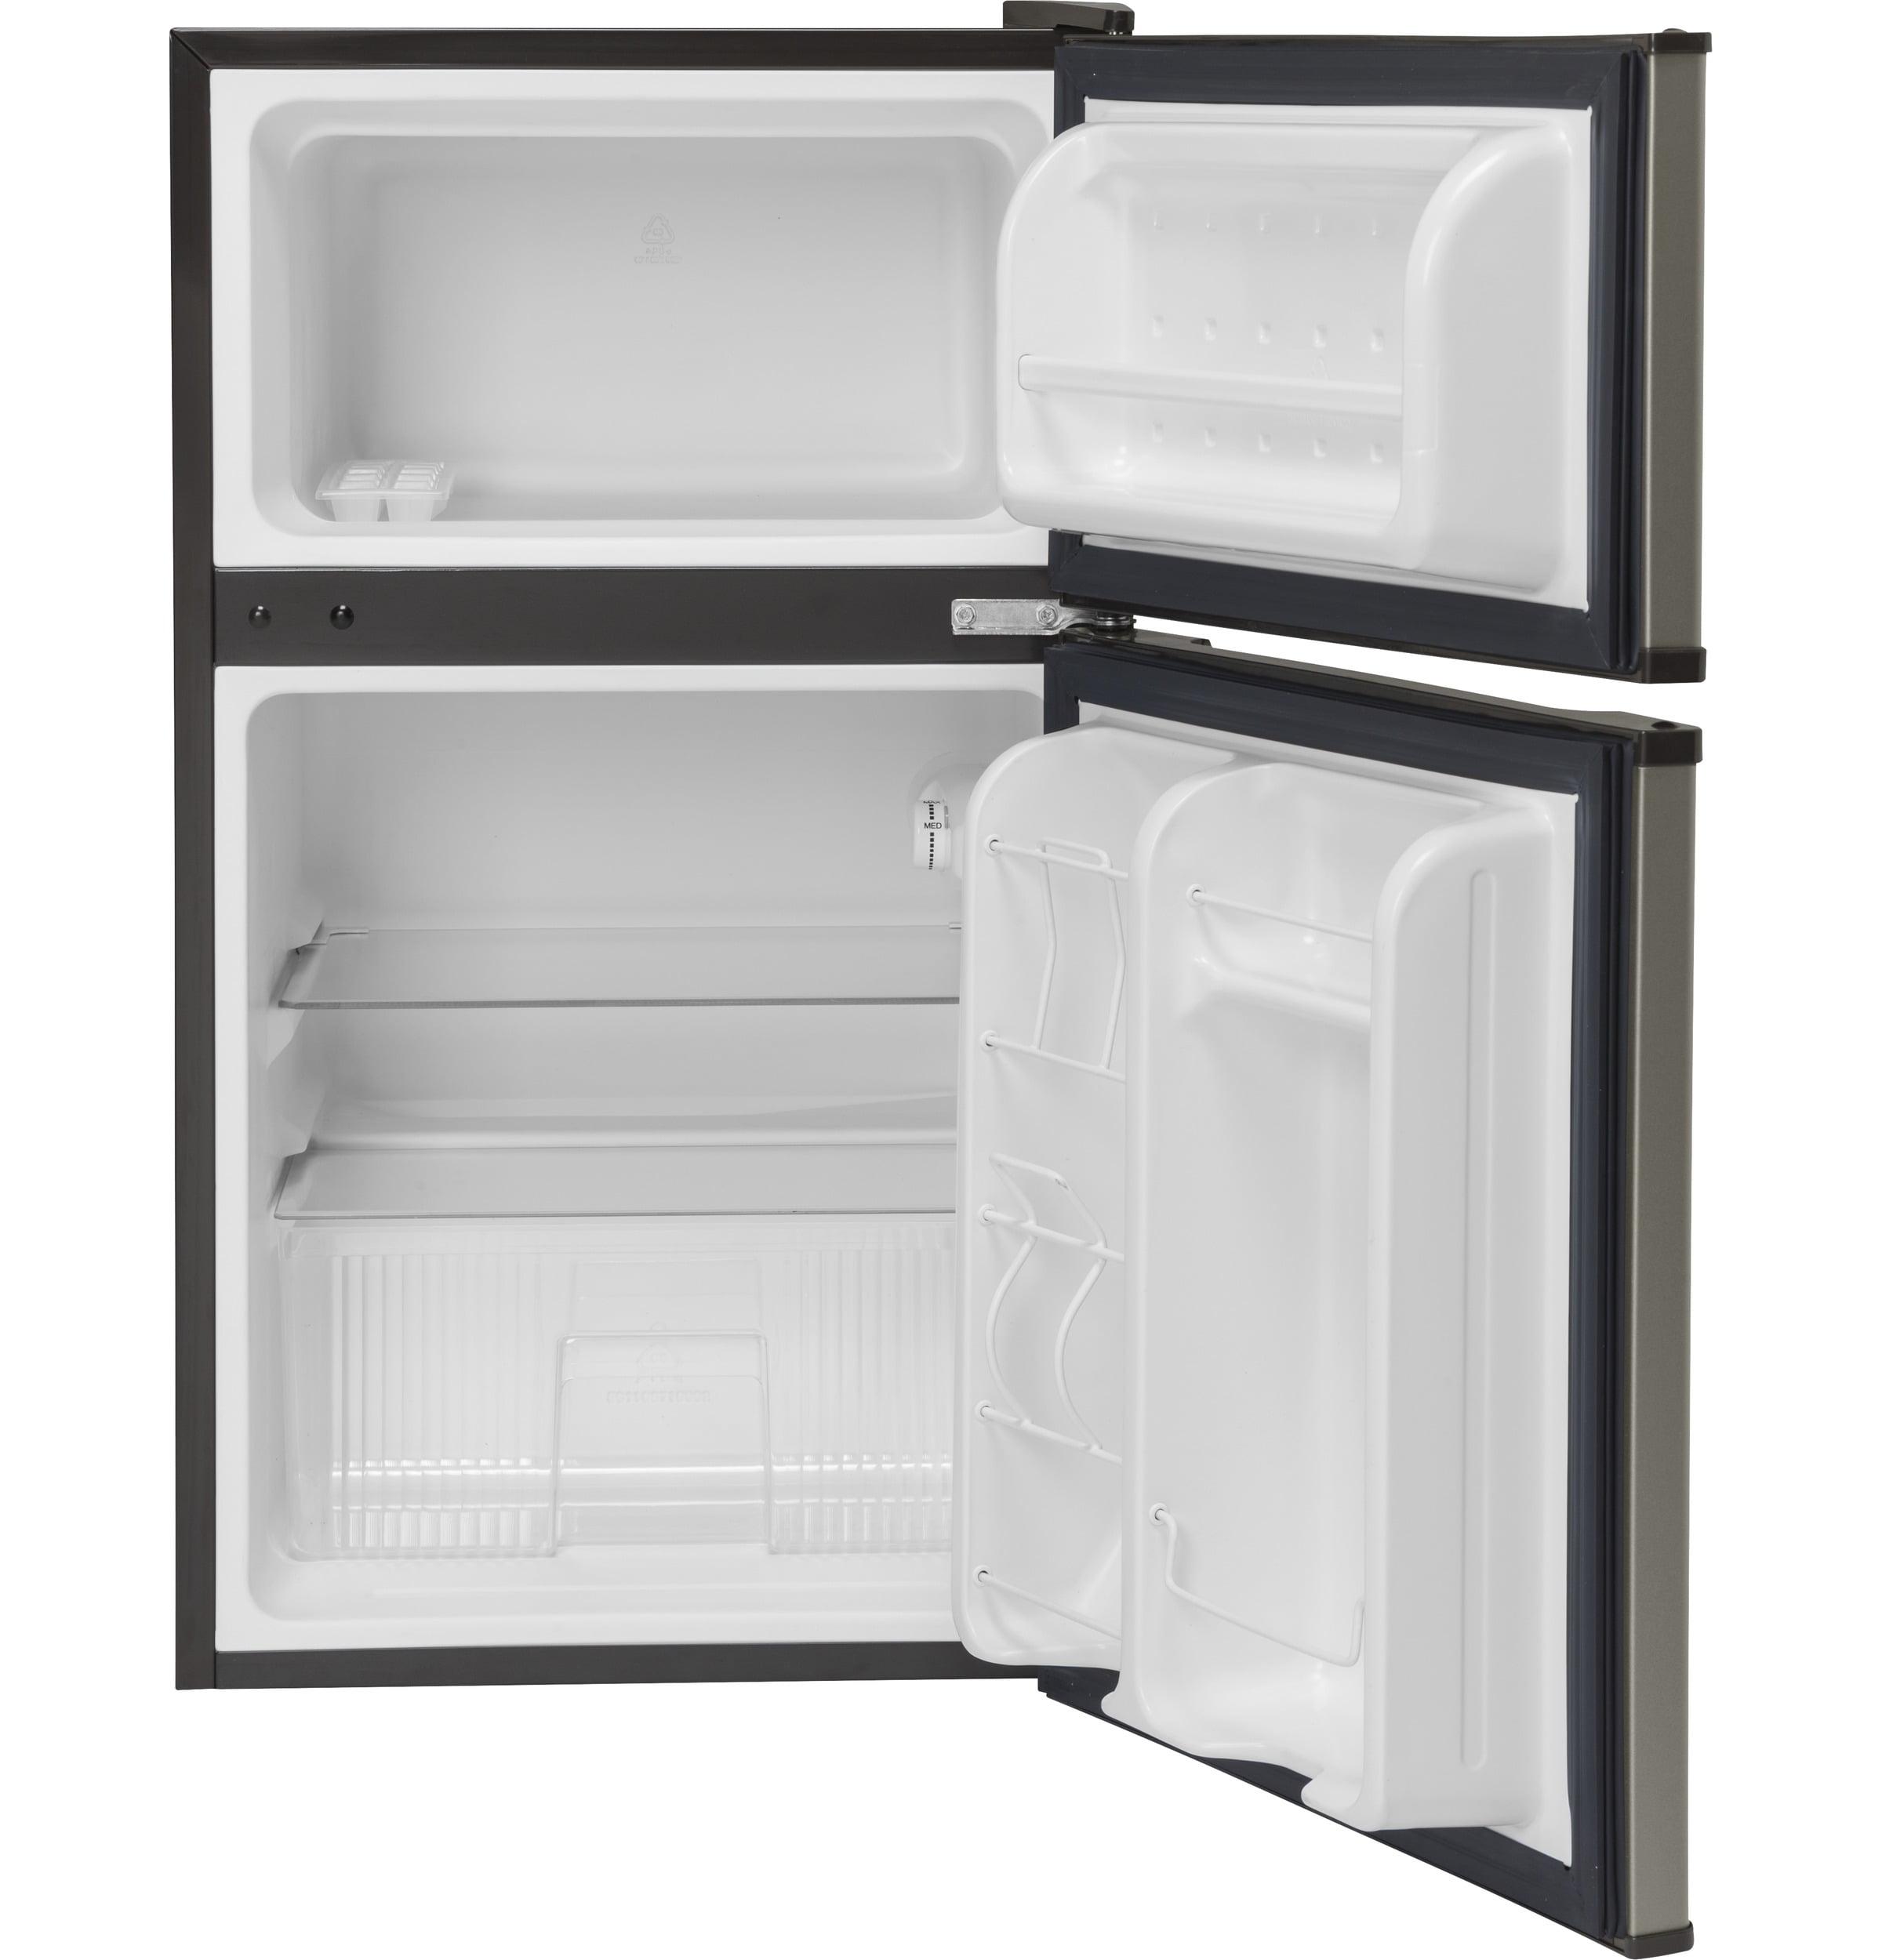 Double Door Compact Refrigerator True Slate Fridge Compartment Home Kitchen  New